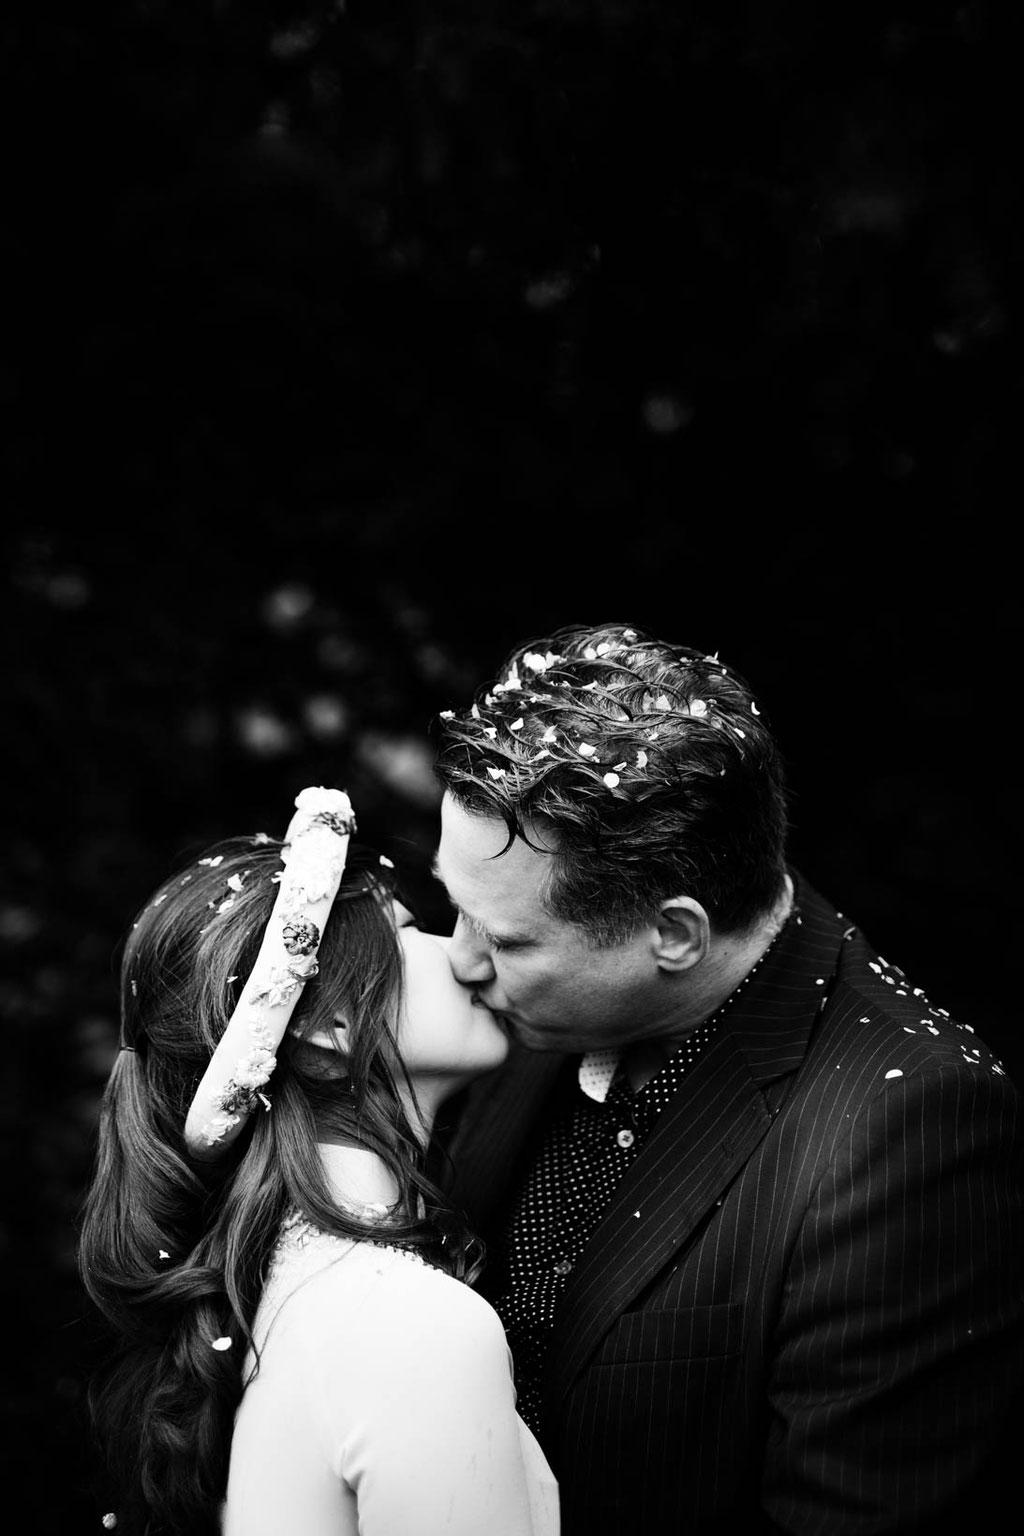 Hochzeitsfotograf_Fotografin_Oer-Erkenschwick_Recklinghausen